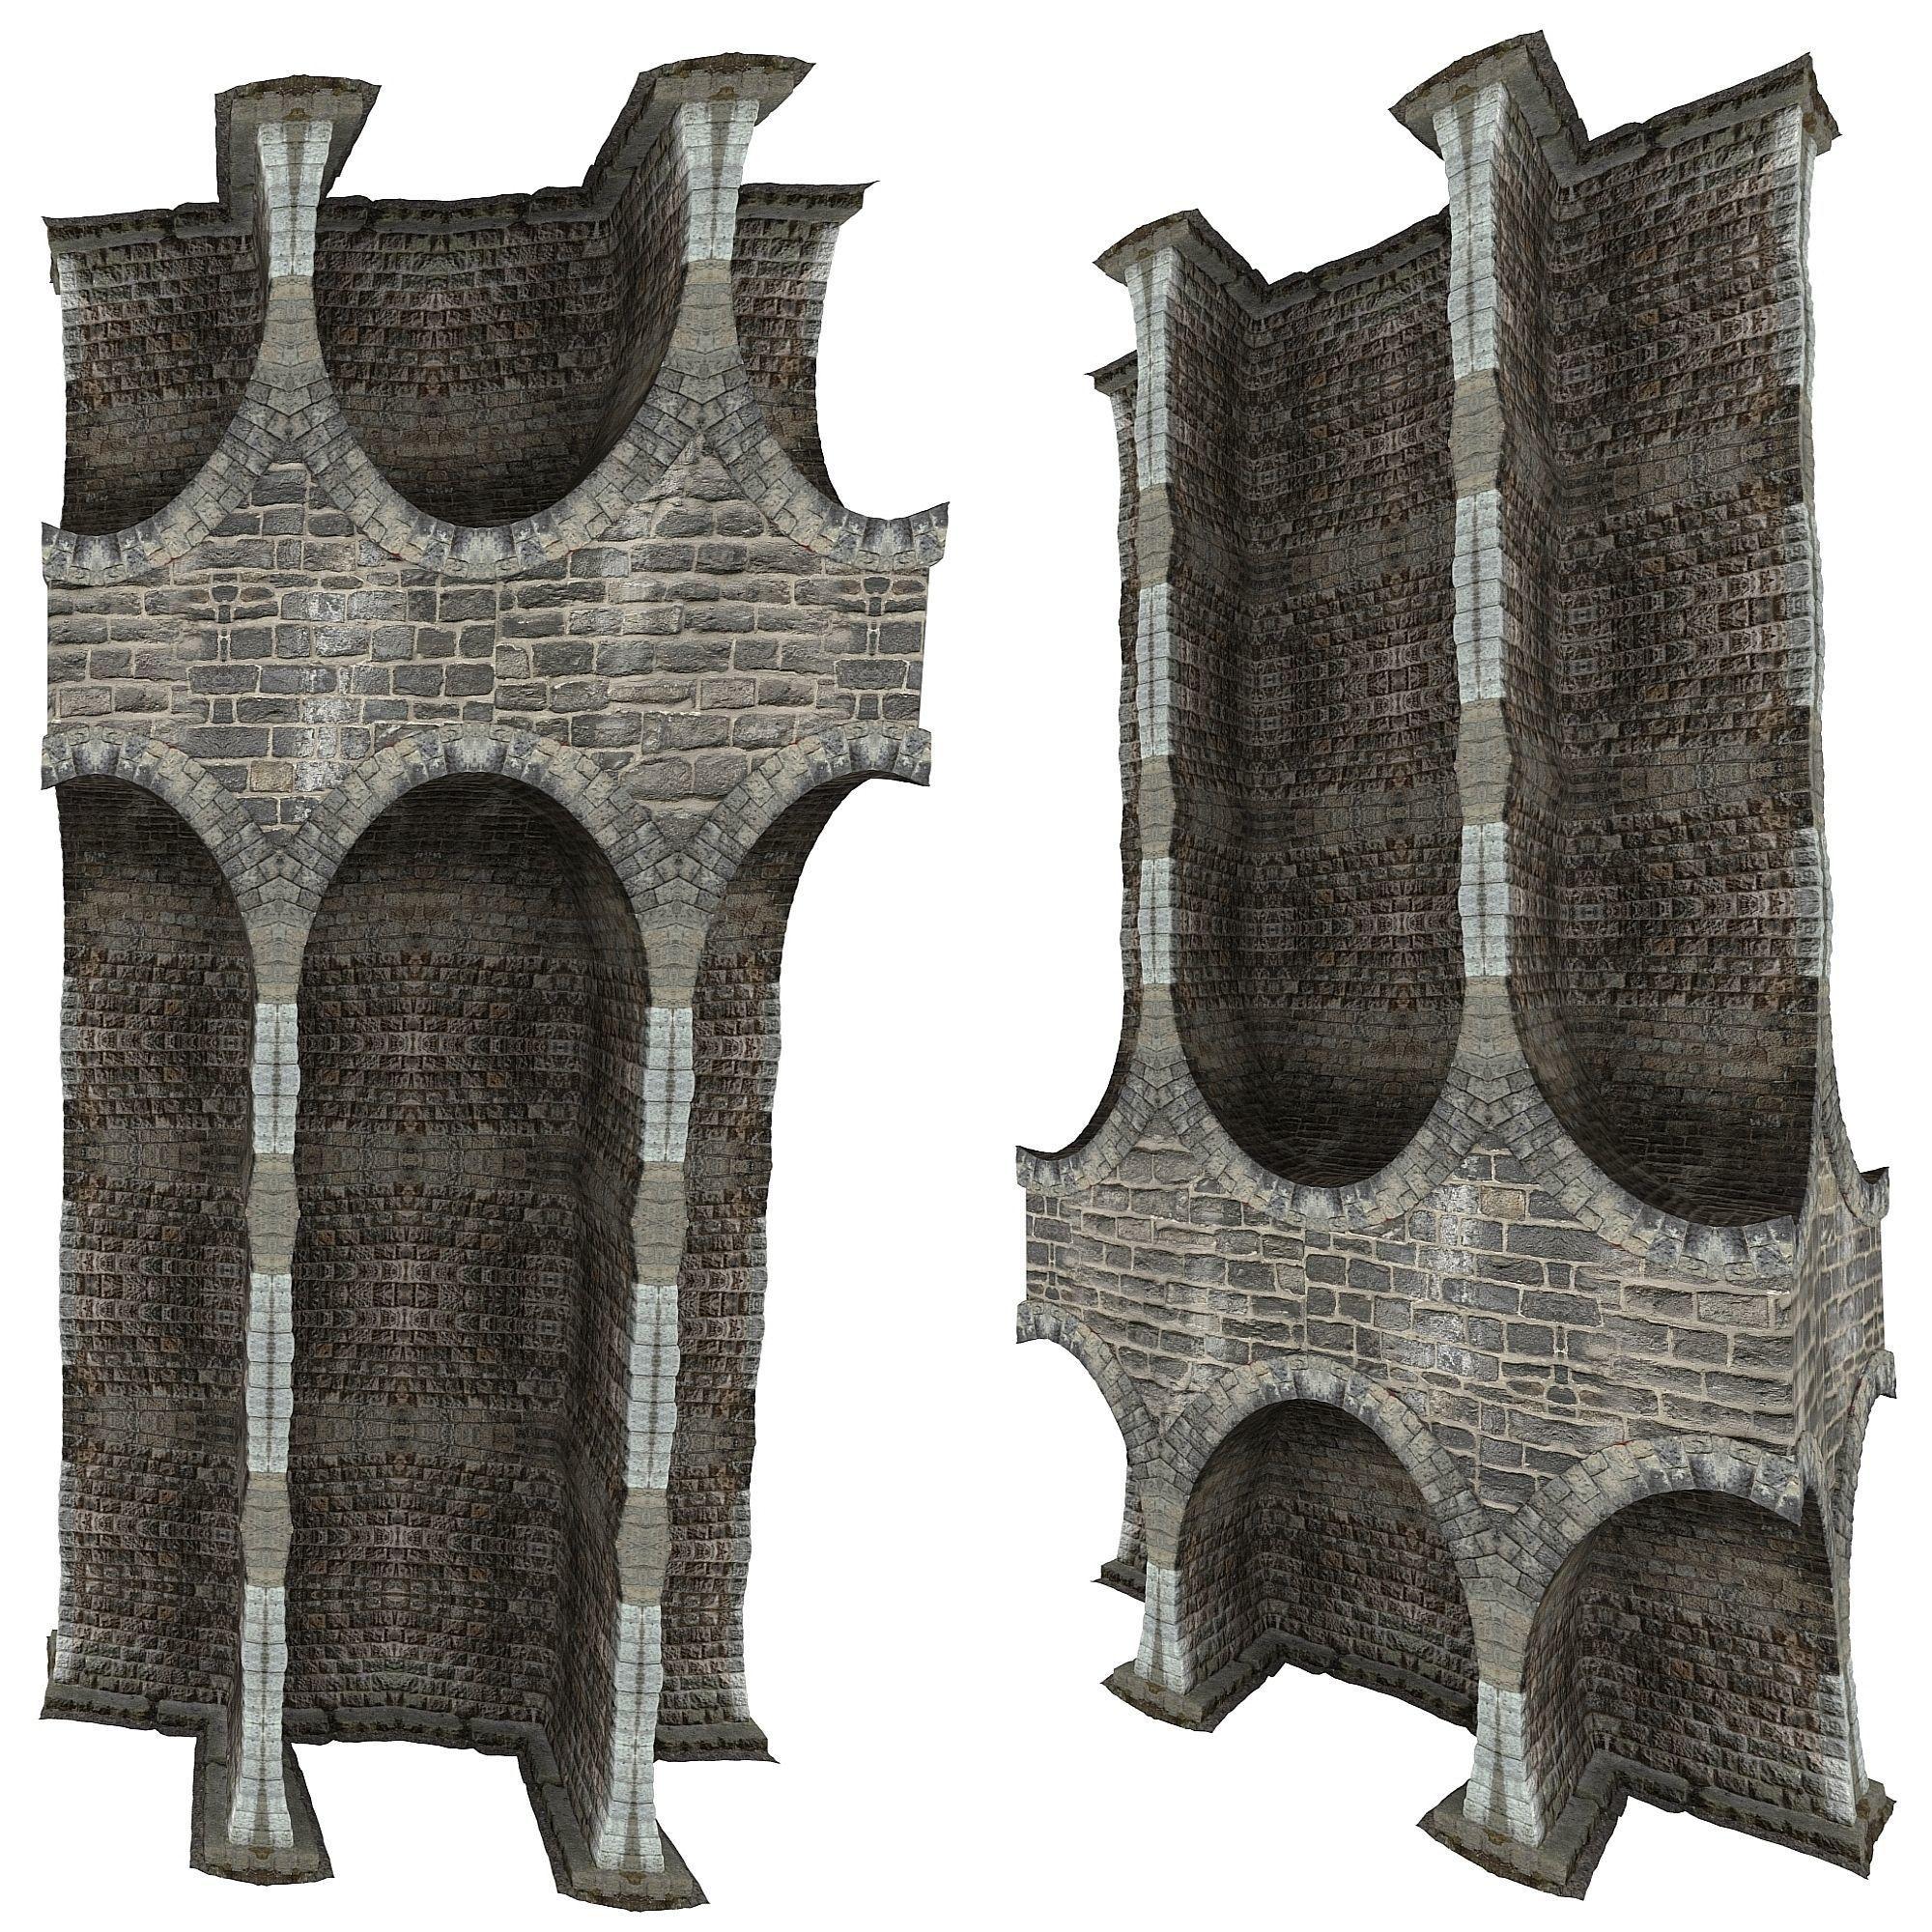 Gatehouse 01 Pillar 09